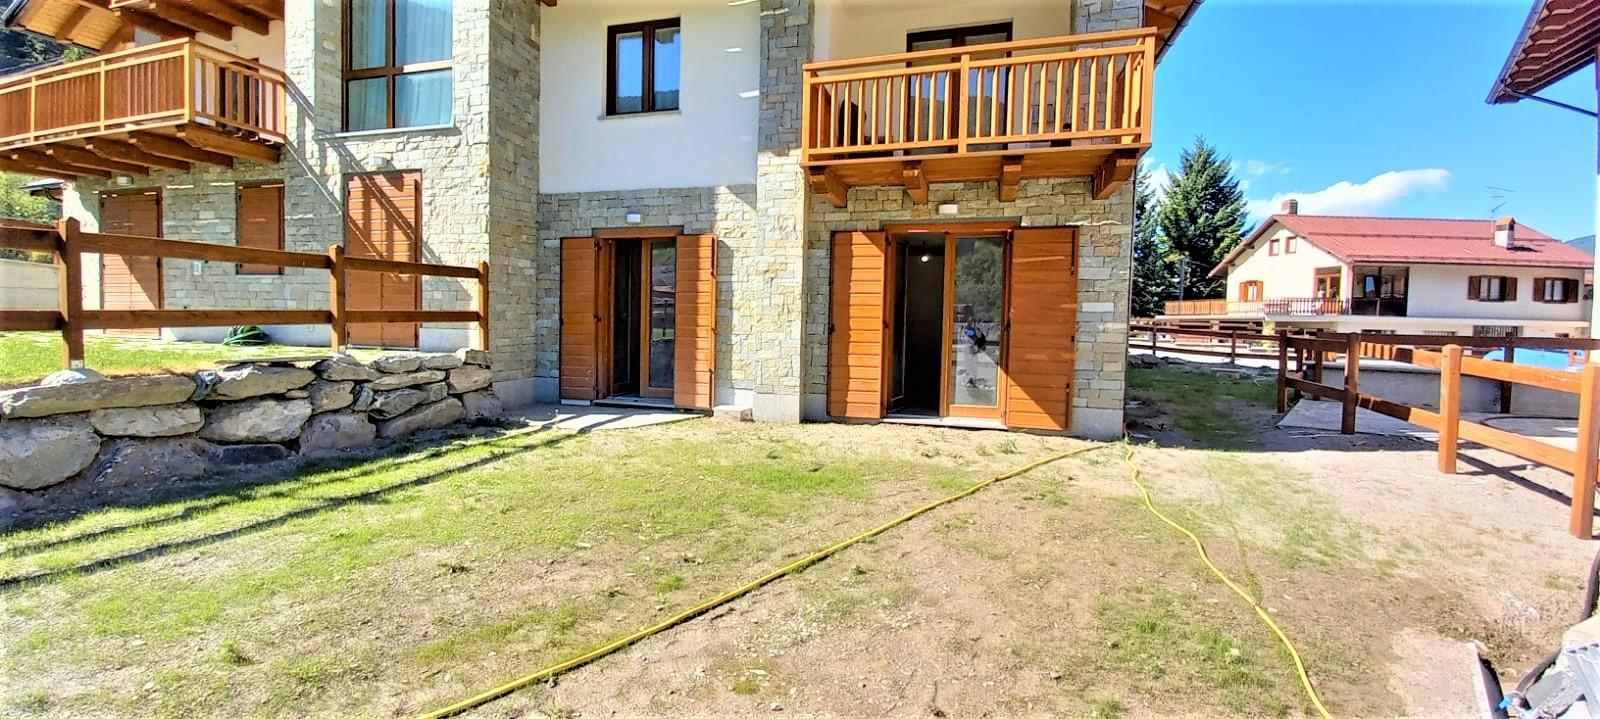 Vendita Trilocale Appartamento Cesana Torinese via g.b. armand  285904